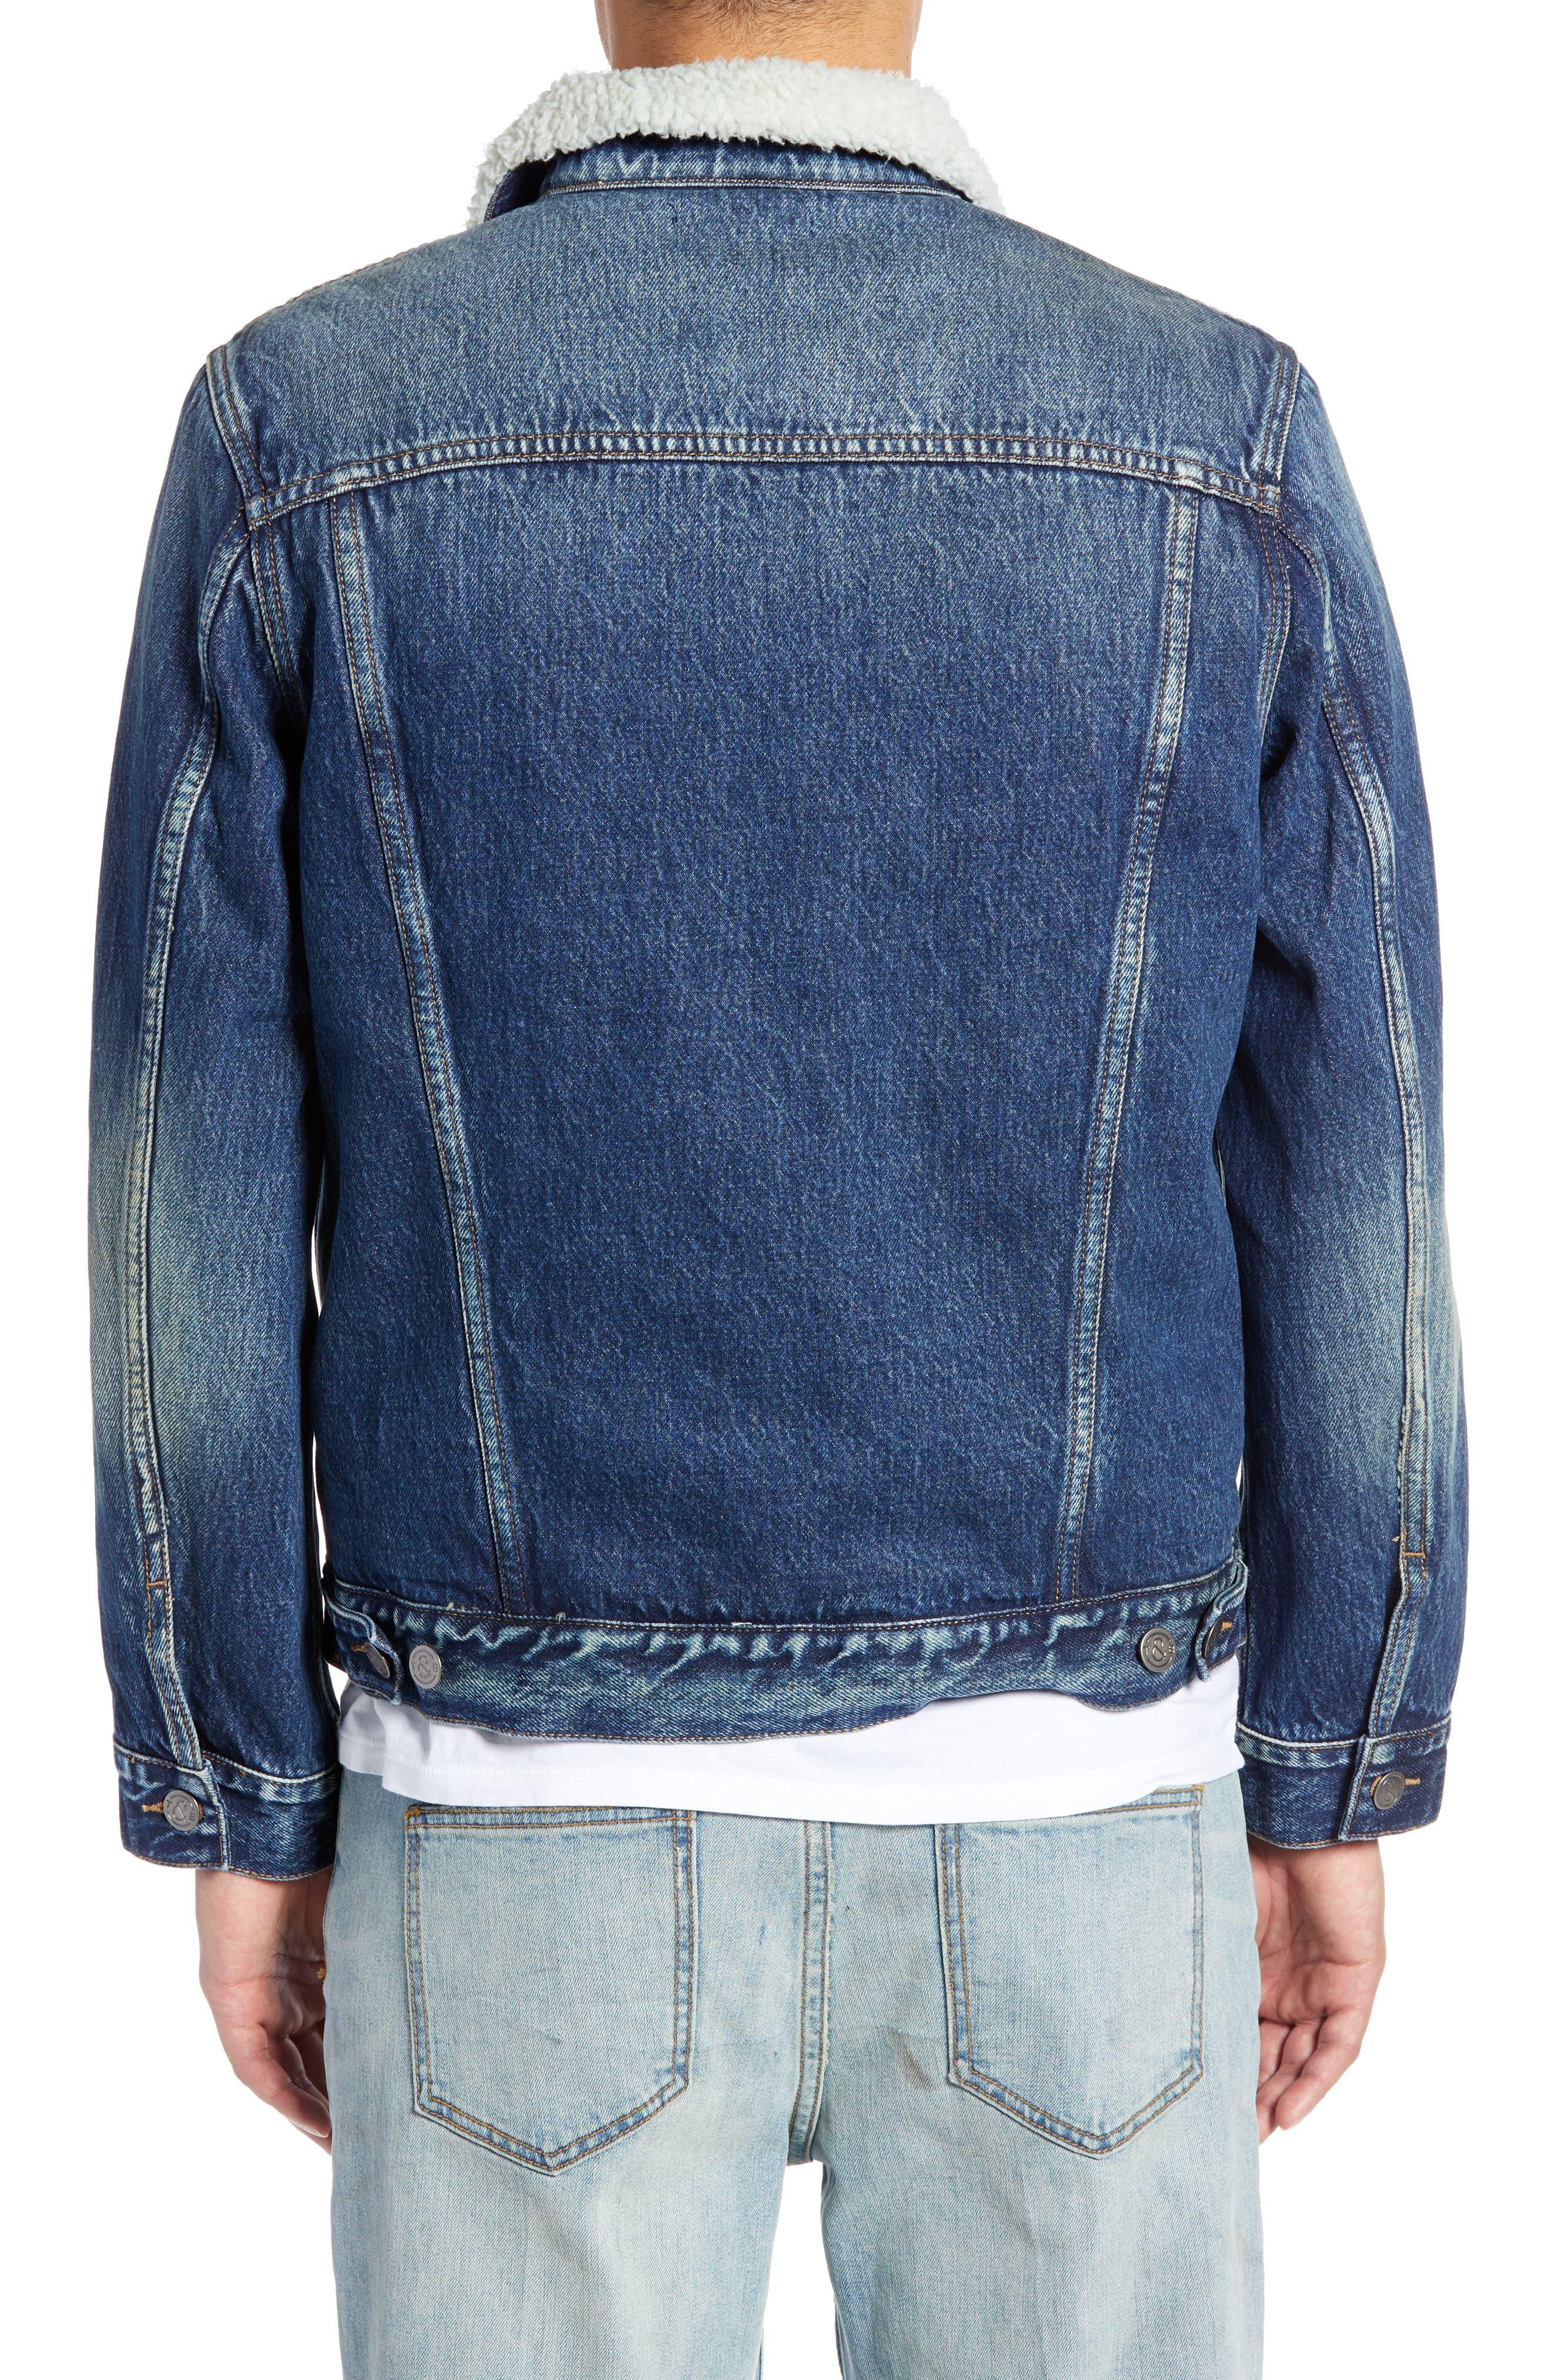 Denim Jacket with Faux Shearling Collar,                             Alternate thumbnail 2, color,                             BLUE MEDIUM DENIM